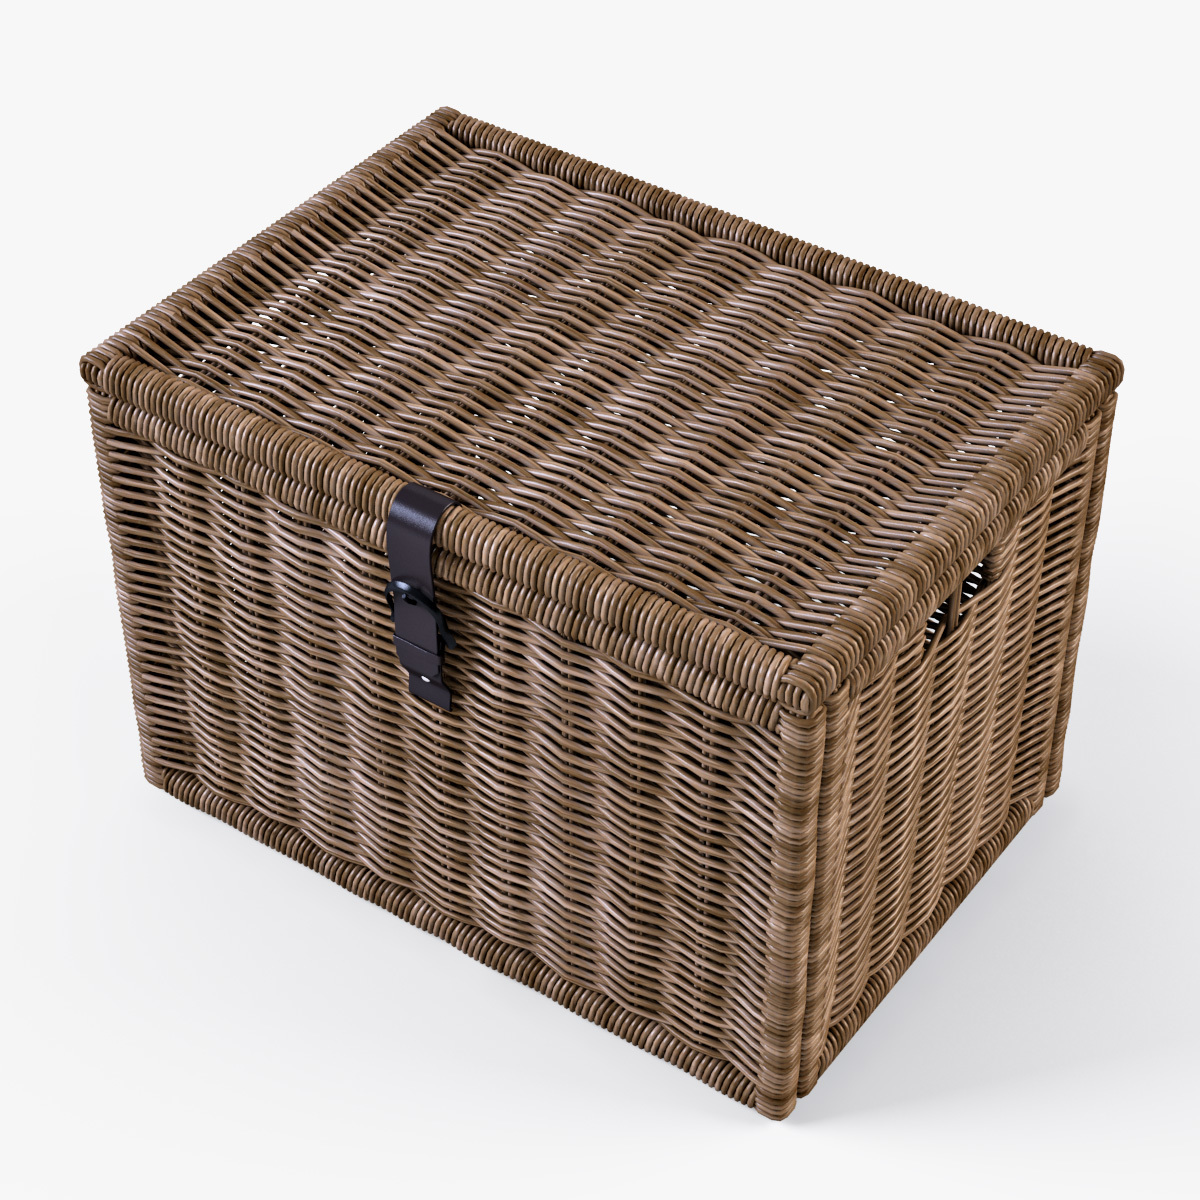 wicker rattan chest ikea byholma by markelos 3docean. Black Bedroom Furniture Sets. Home Design Ideas